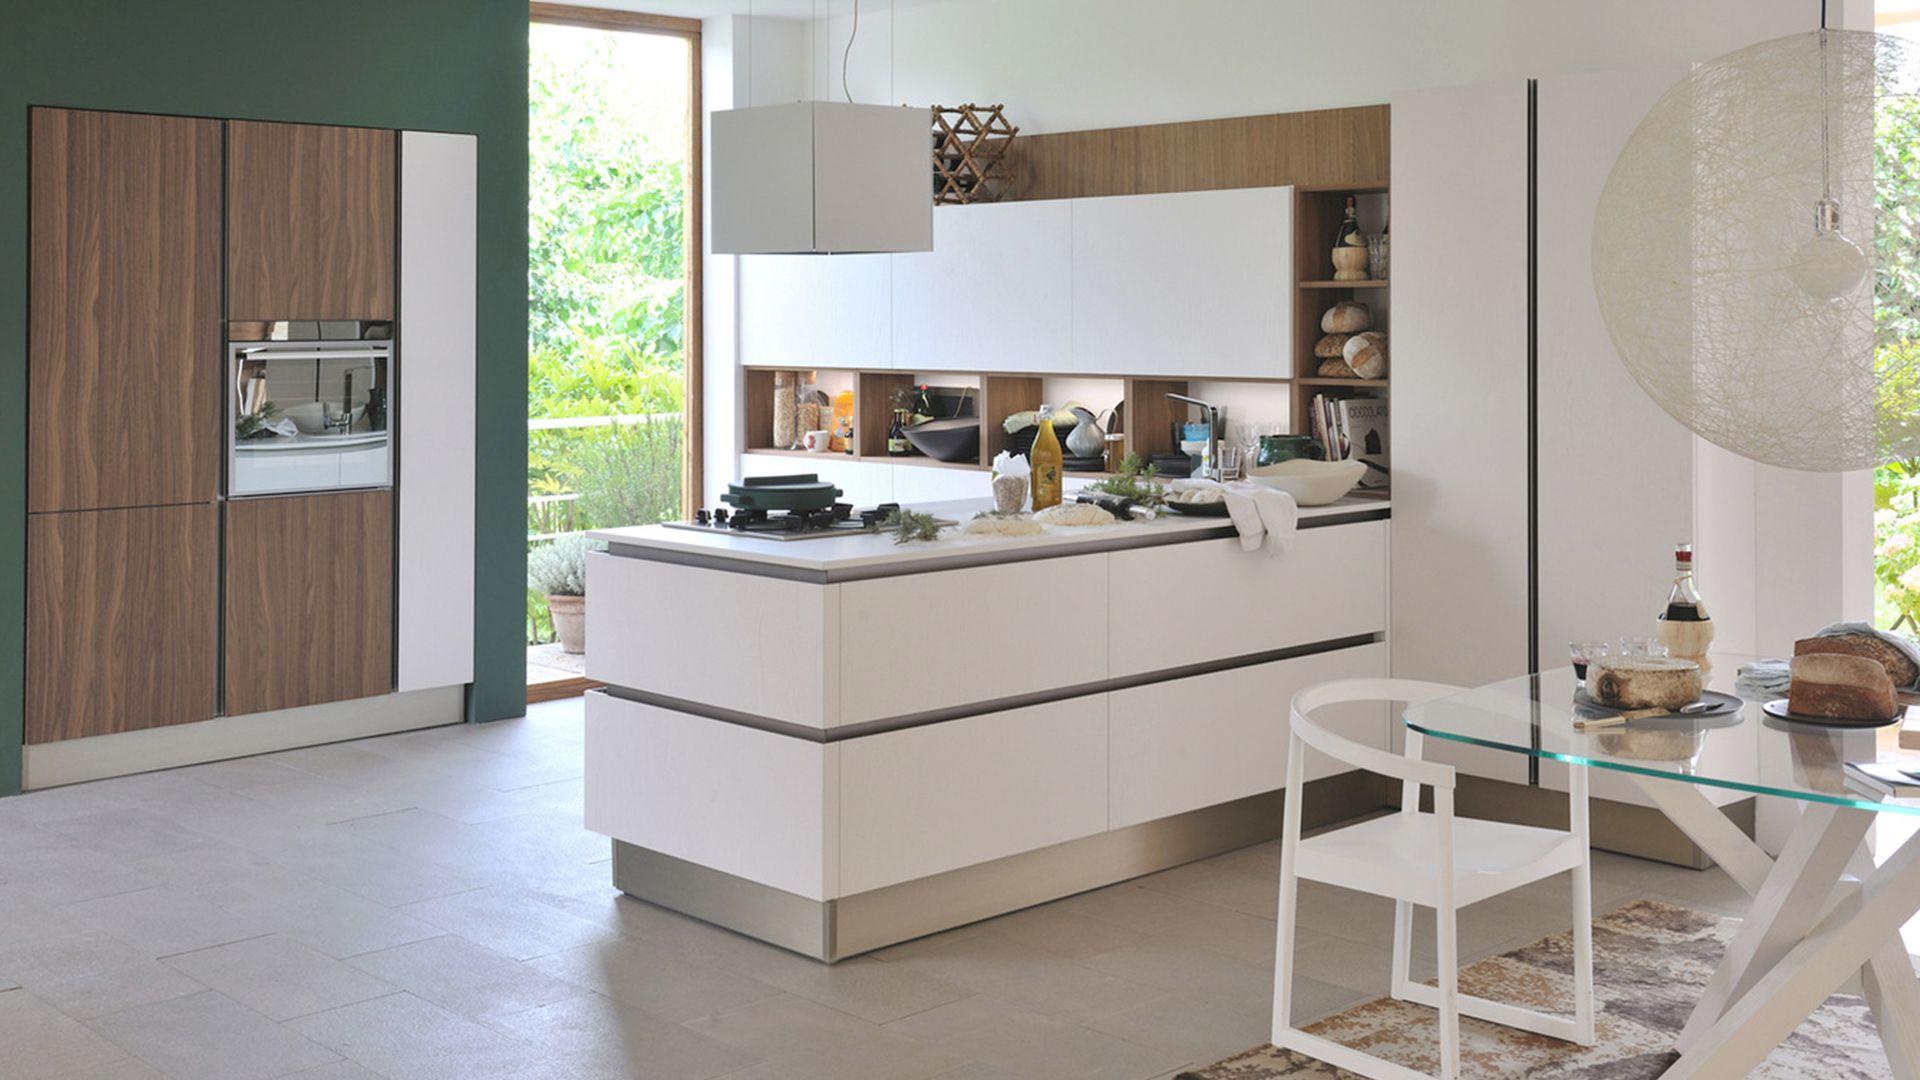 Sweet Home 3d Modelli Veneta Cucine.Kuhinja Veneta Cucine Model Oyster Pro Harvey Norman